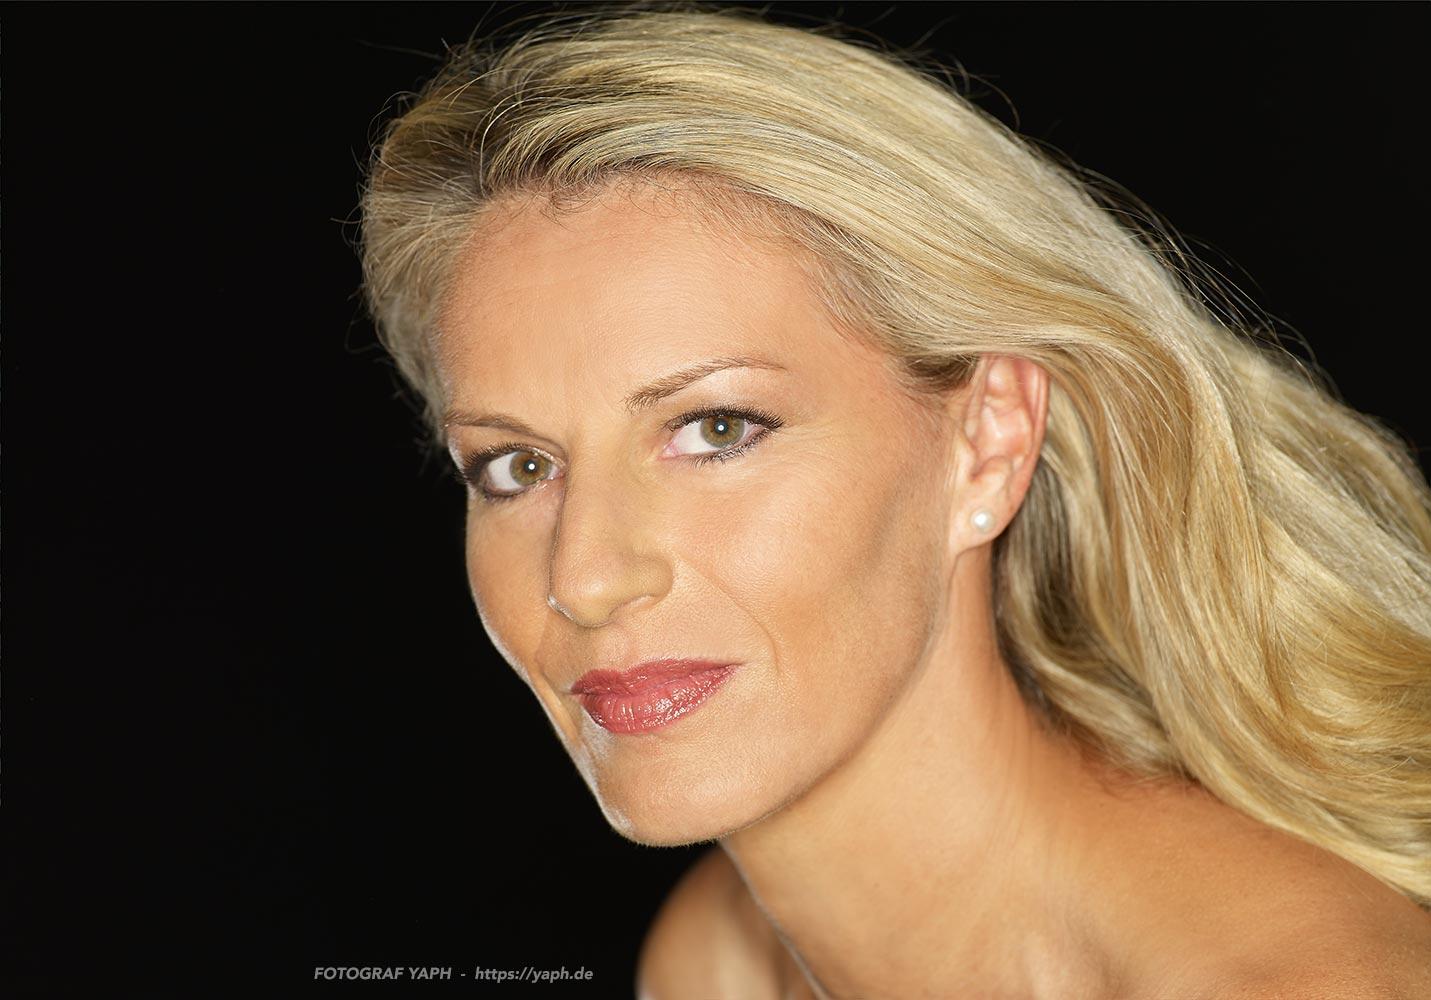 Birgit - Beauty photoshooting  im Fotoatelier Yaph auf dem Petrisberg in Trier